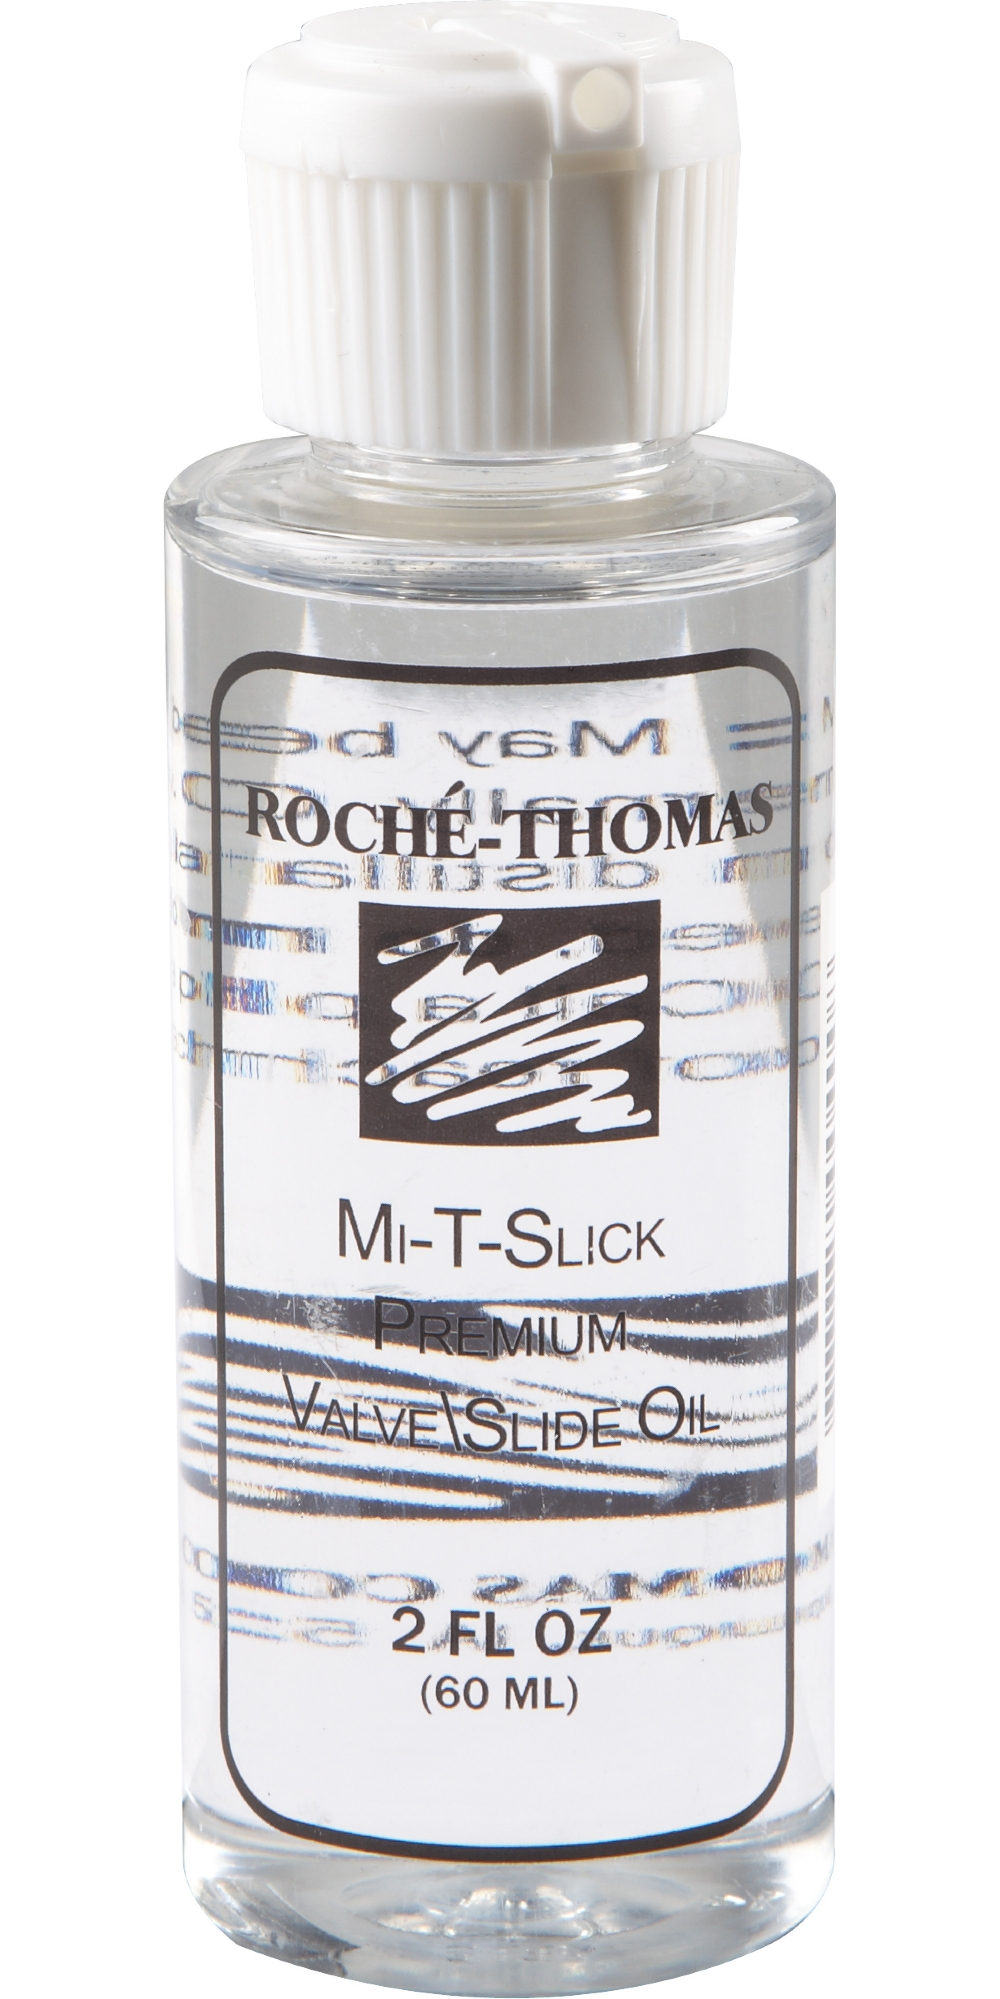 Roche Thomas Slick Valve   Slide Oil 2oz Bottle by Roche Thomas